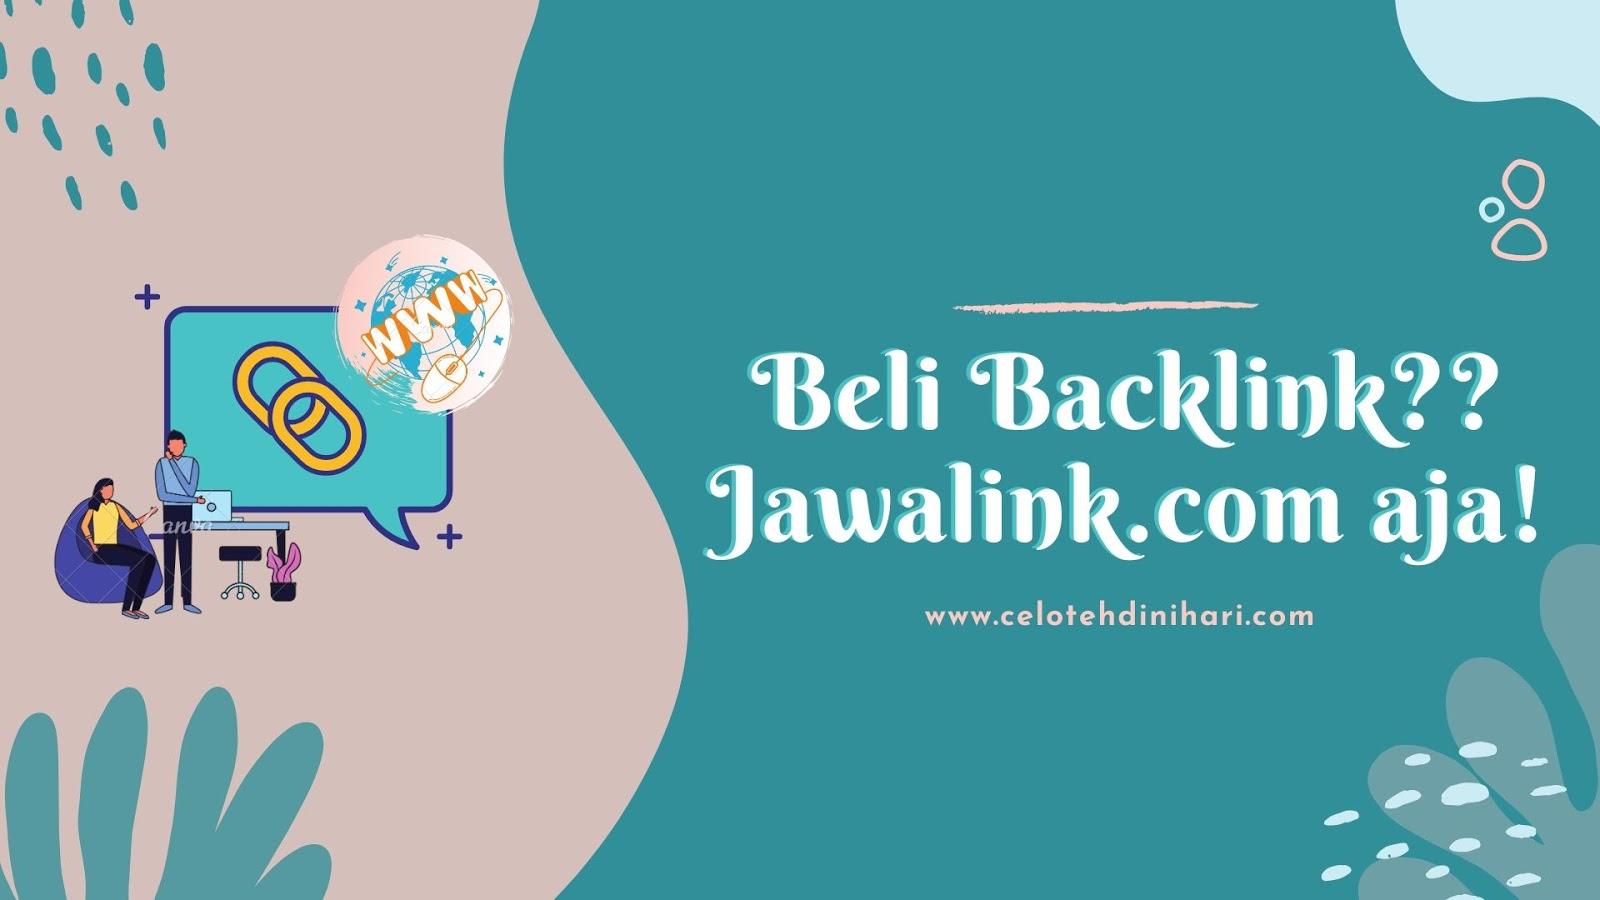 beli backlink di jawalink.com